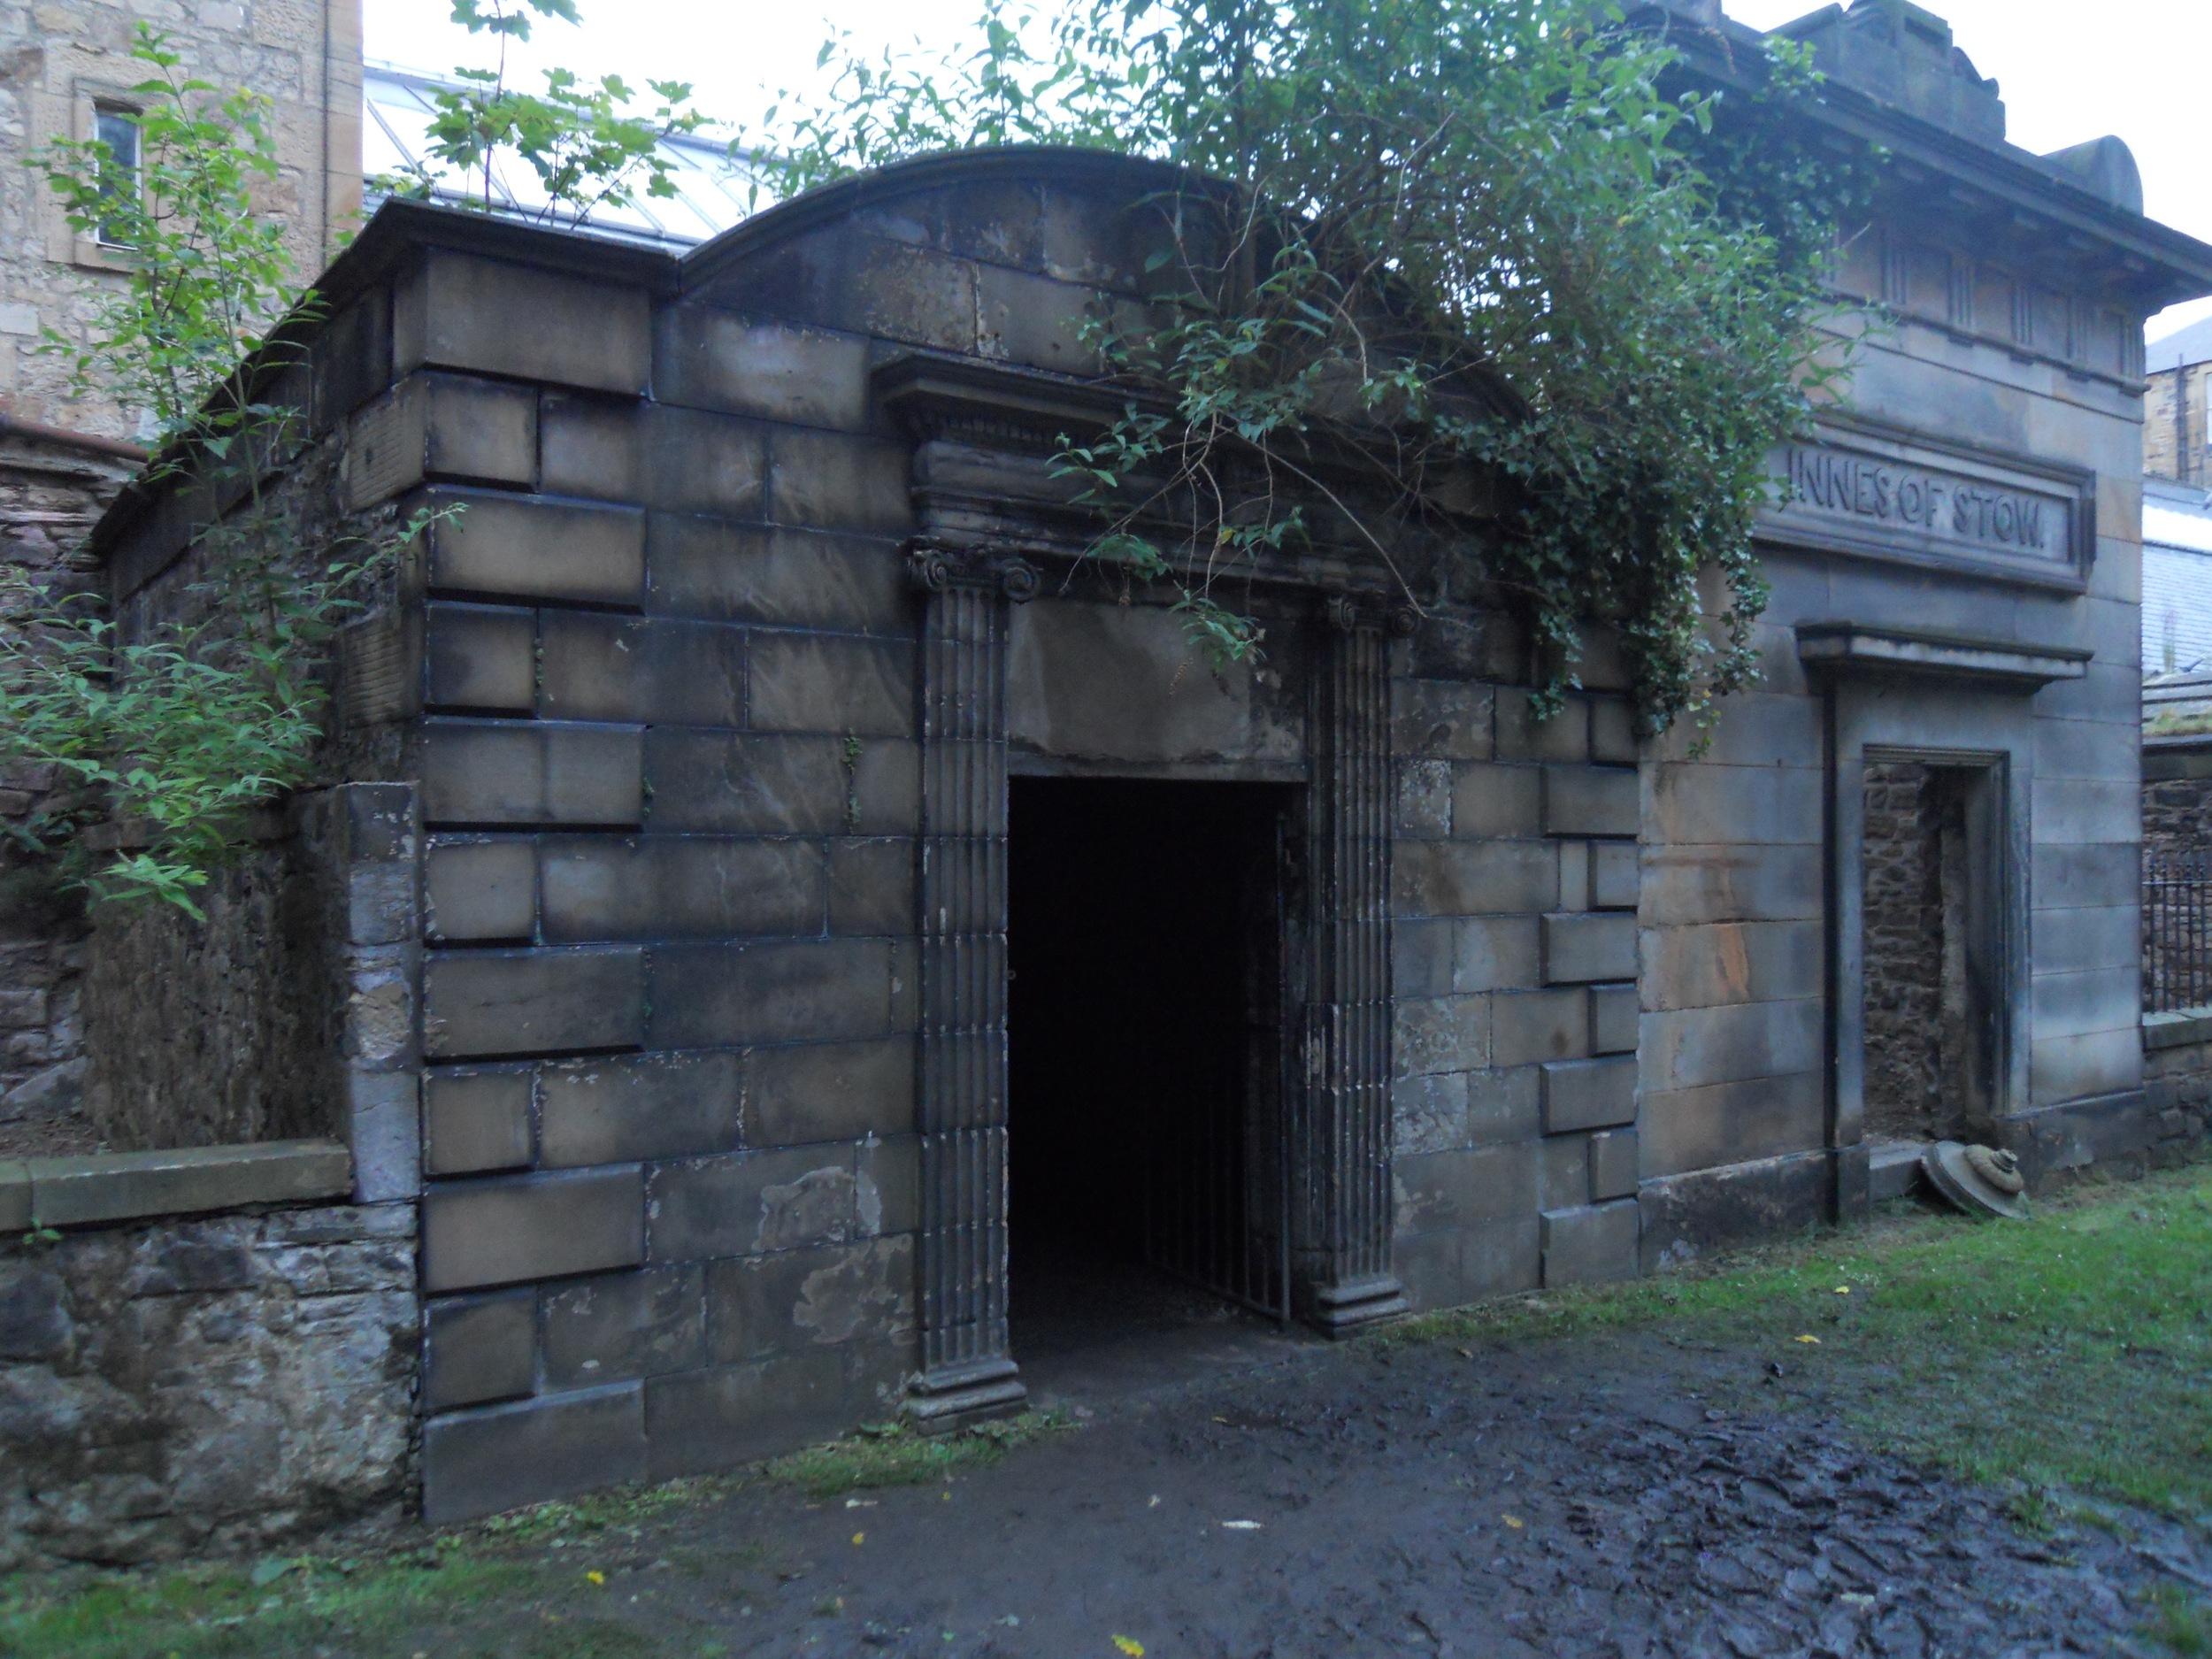 The mausoleum where you'll find the Mackenzie poltergeist!